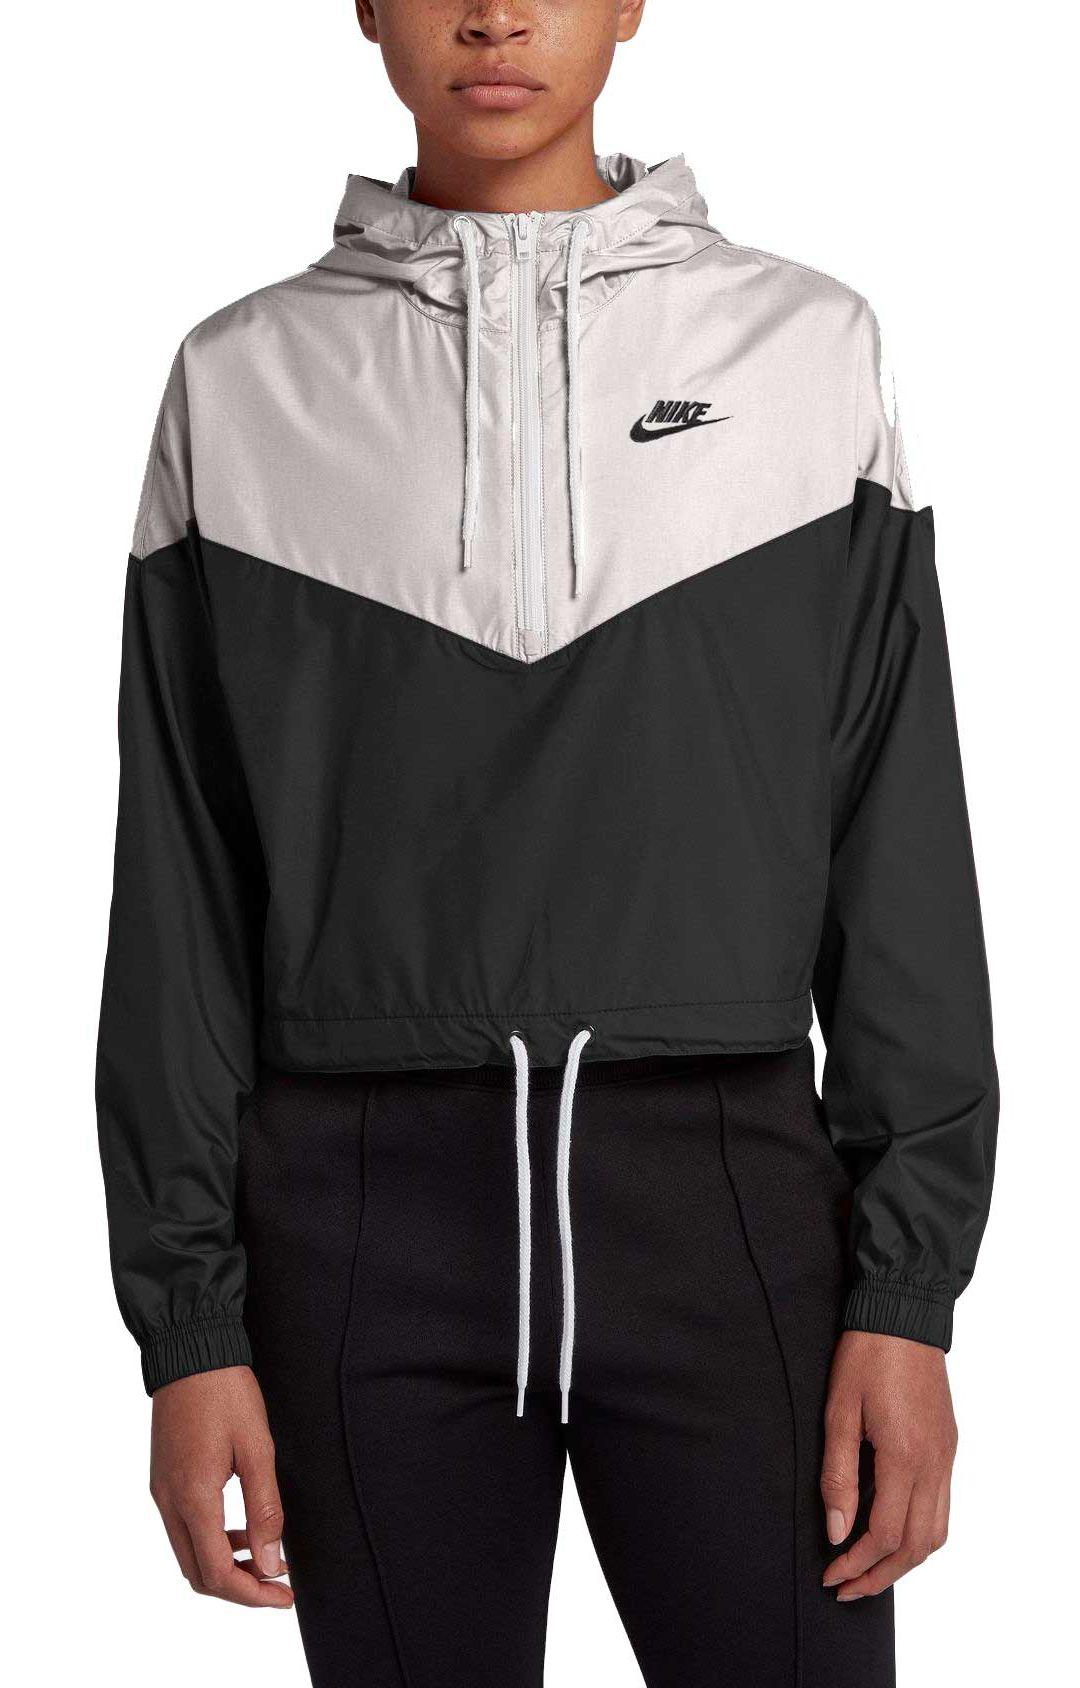 de4844d572e14 Nike Women's Sportswear Heritage Windrunner Jacket. noImageFound. Previous